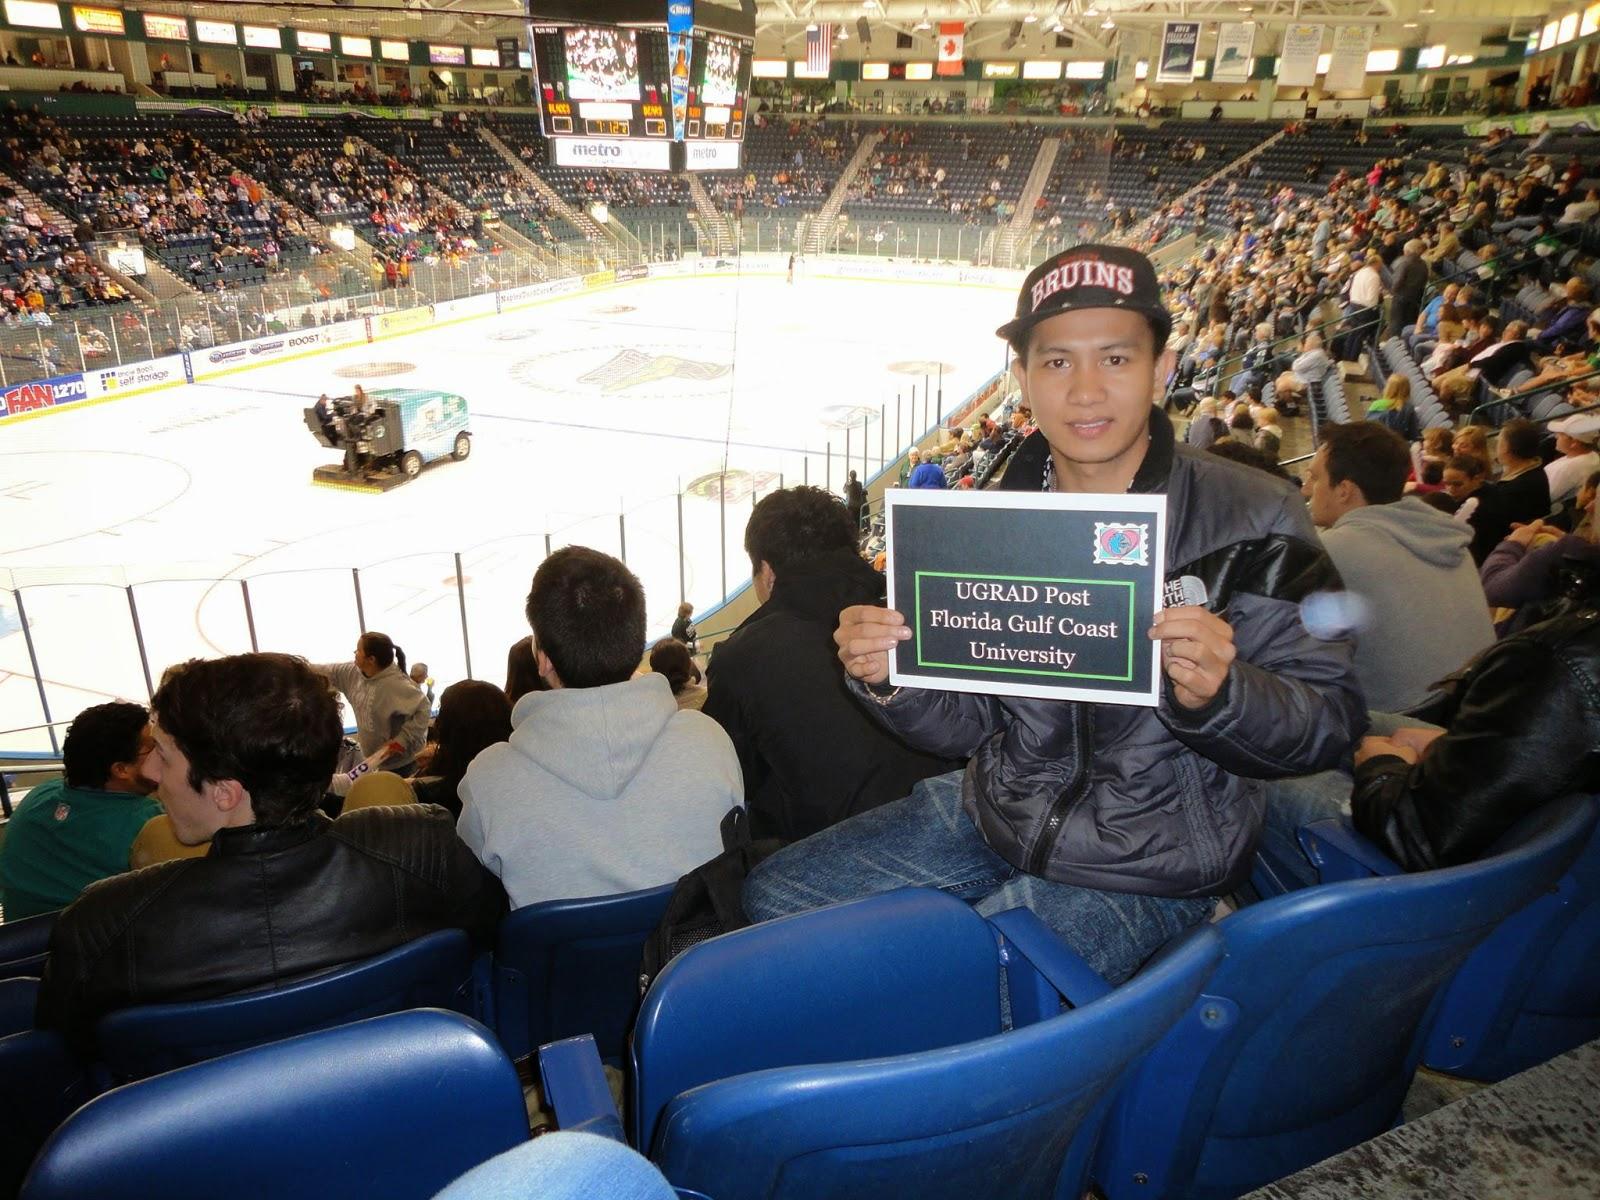 Ice Hockey at Germain Arena, Florida